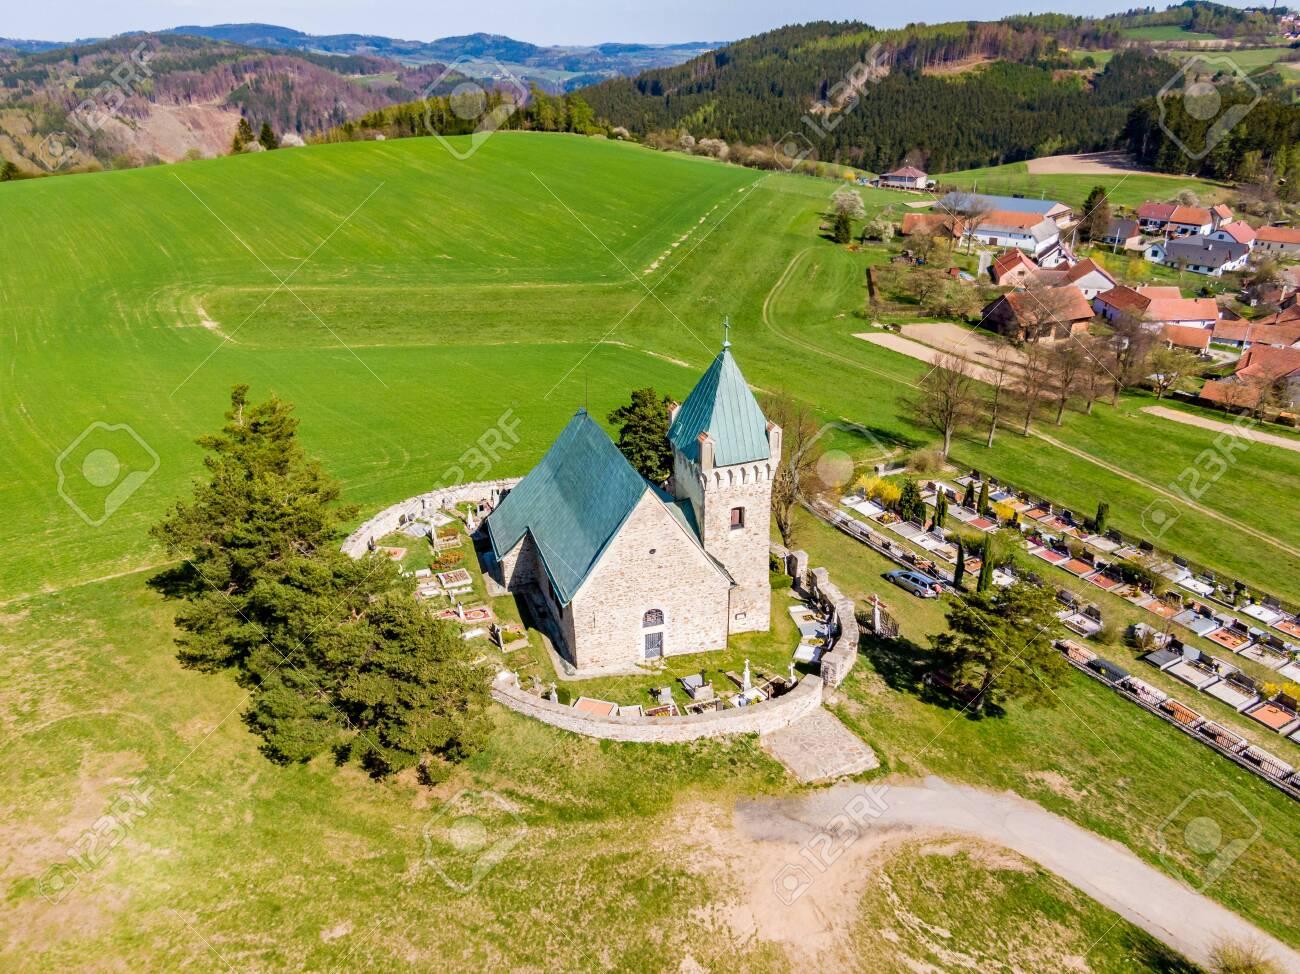 Aerial view of St Michael chapel in czech republic  Chapel is